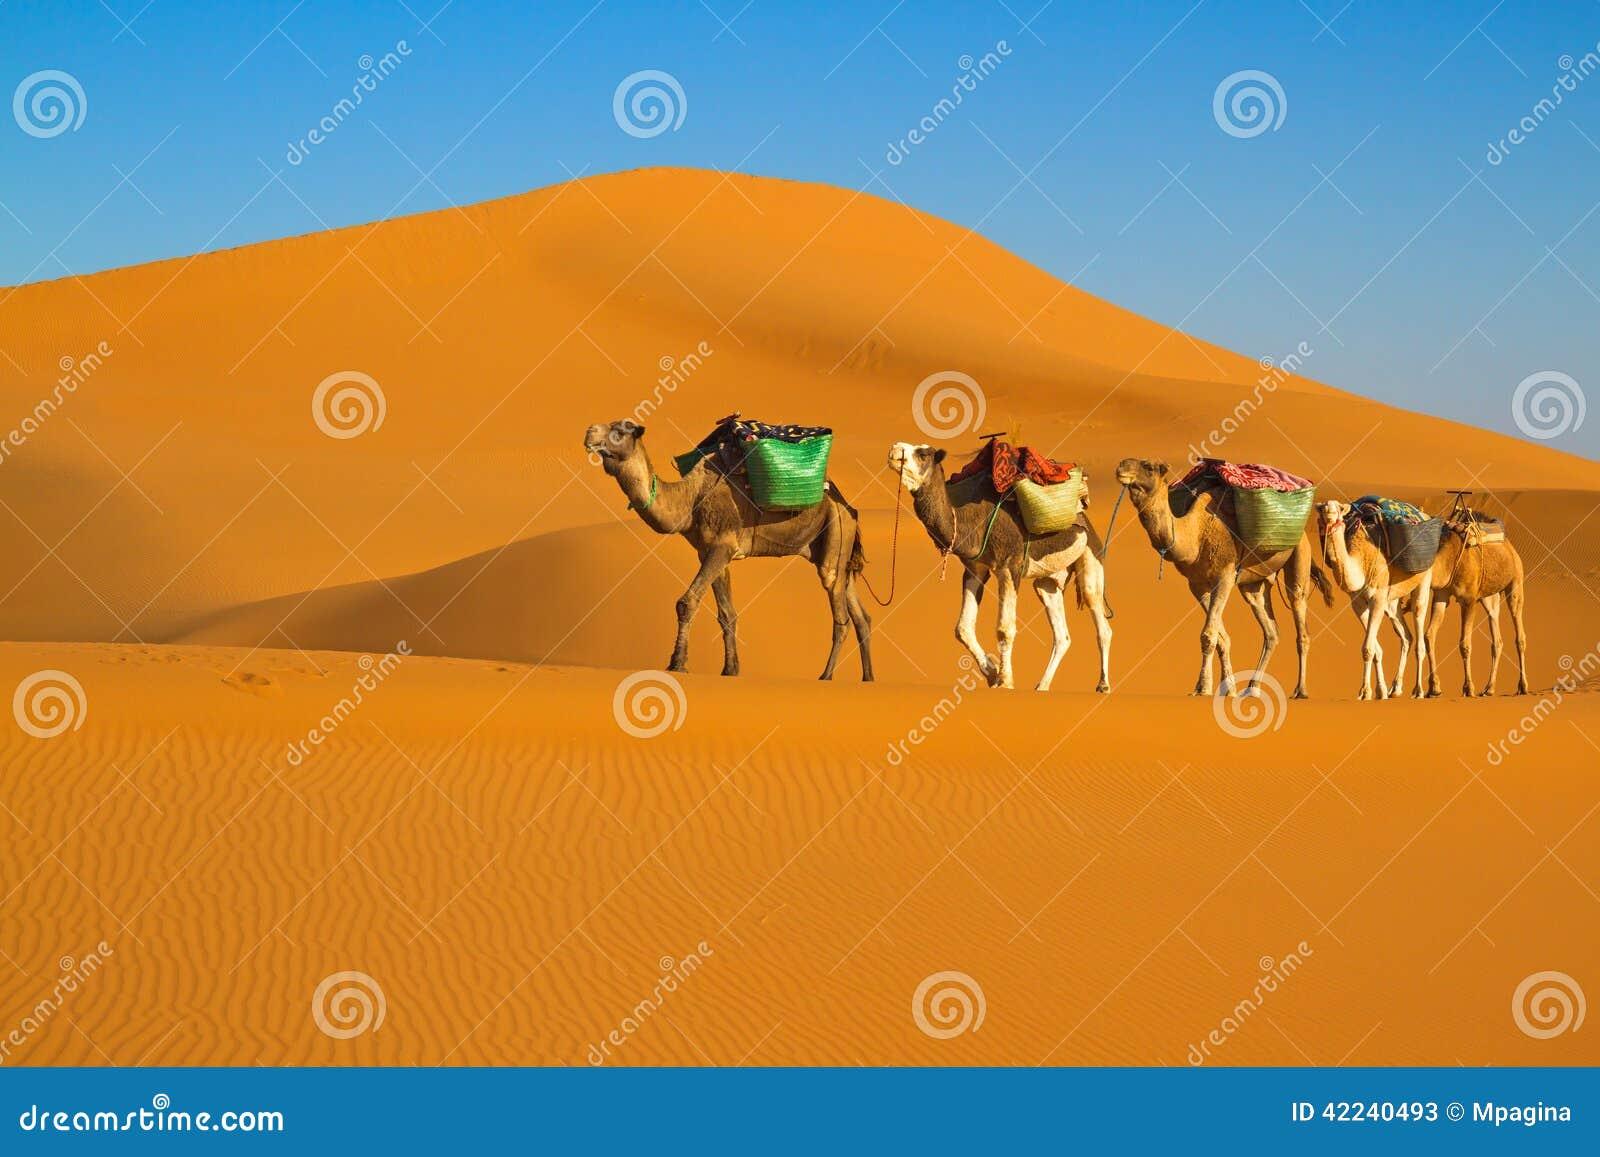 Desert Caravan Stock Photo - Image: 42240493